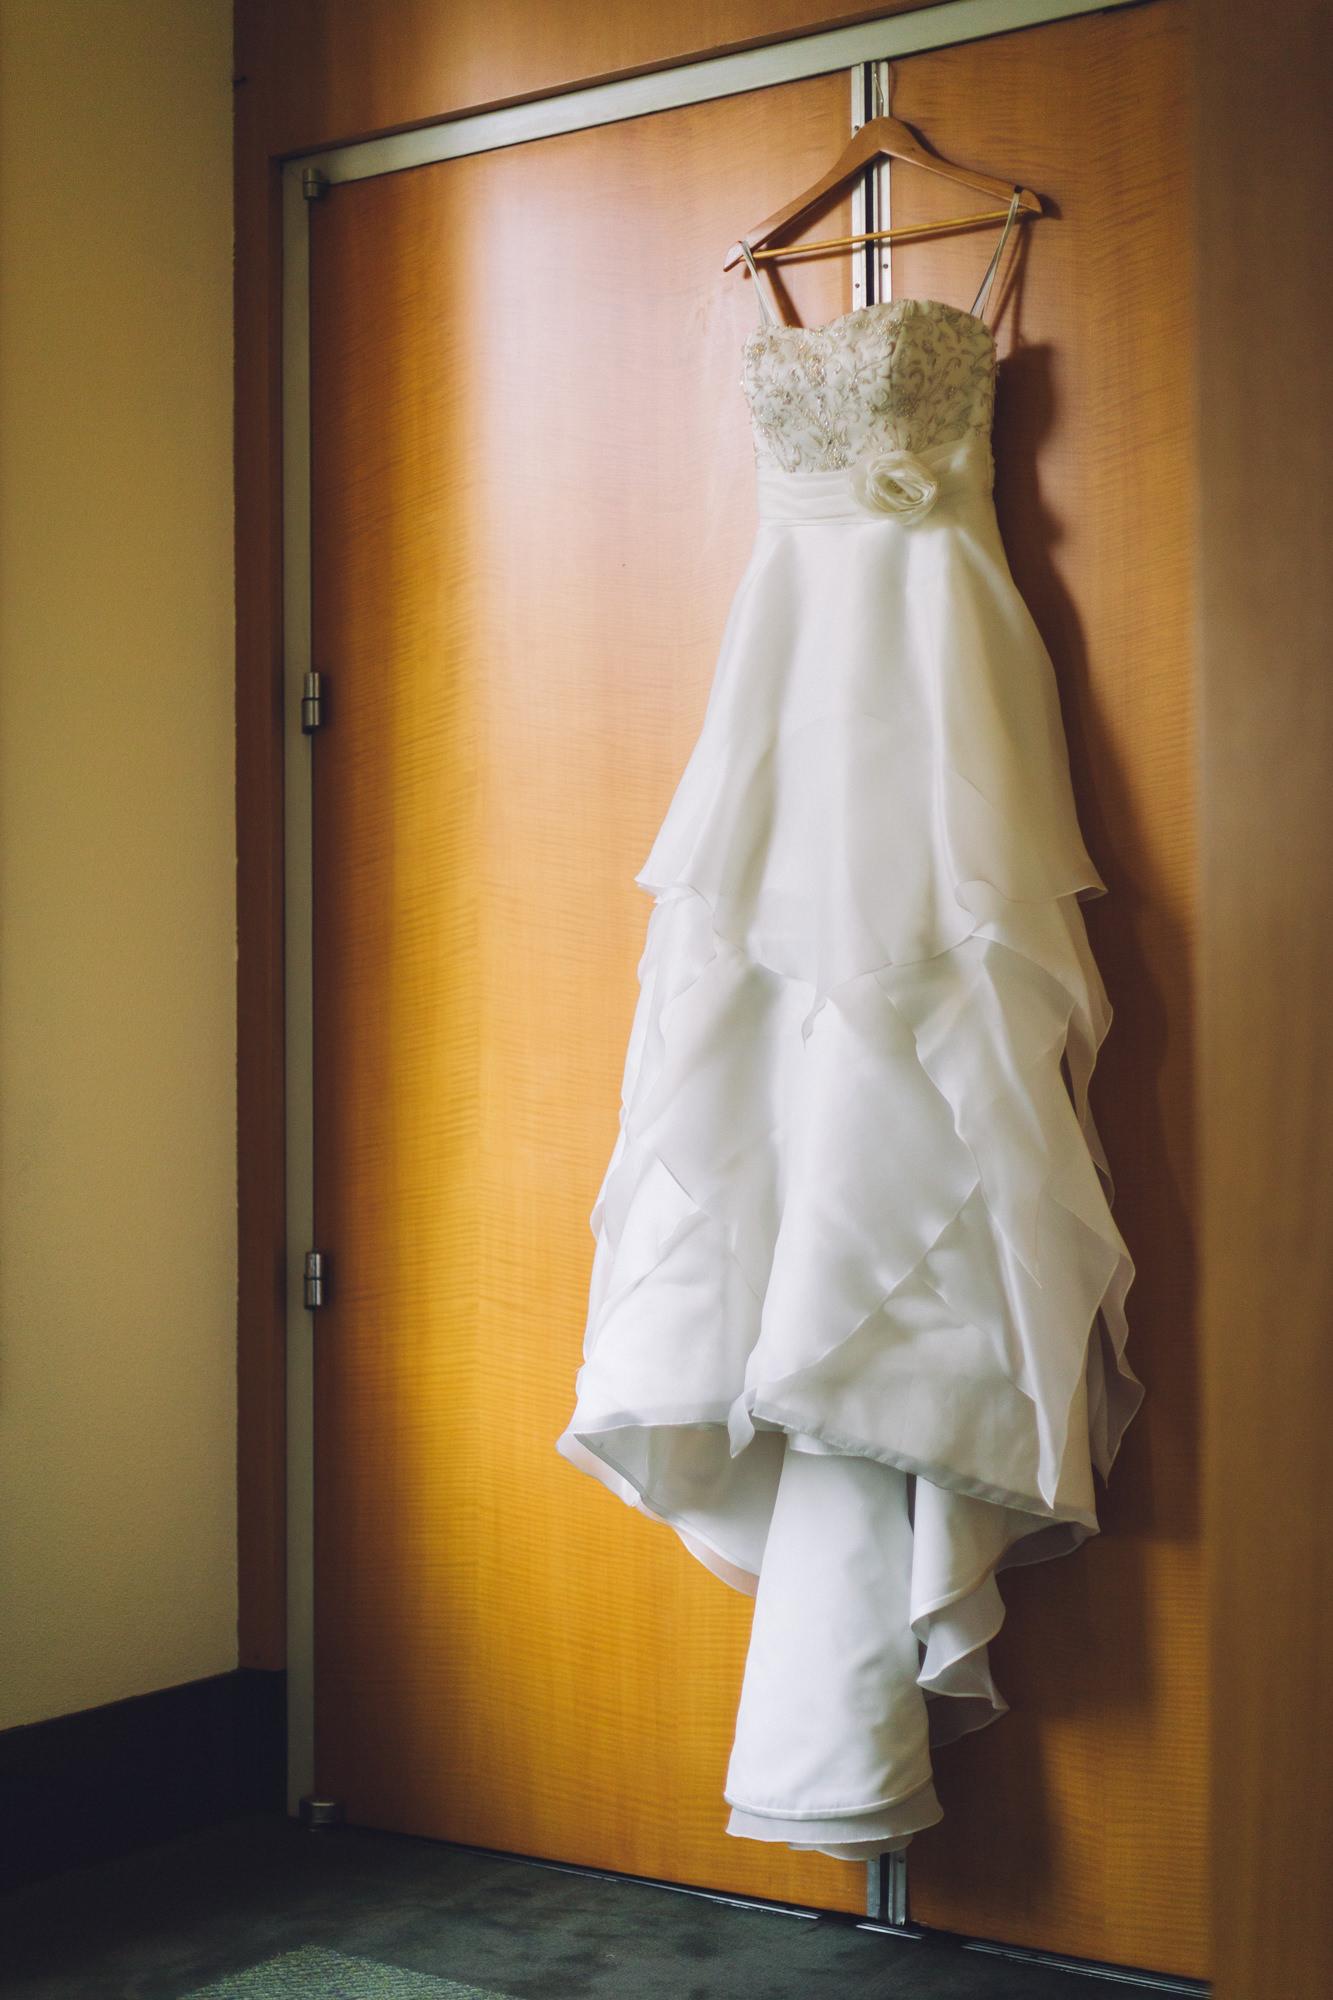 thelightandglass-wedding-engagement-photography-009.jpg